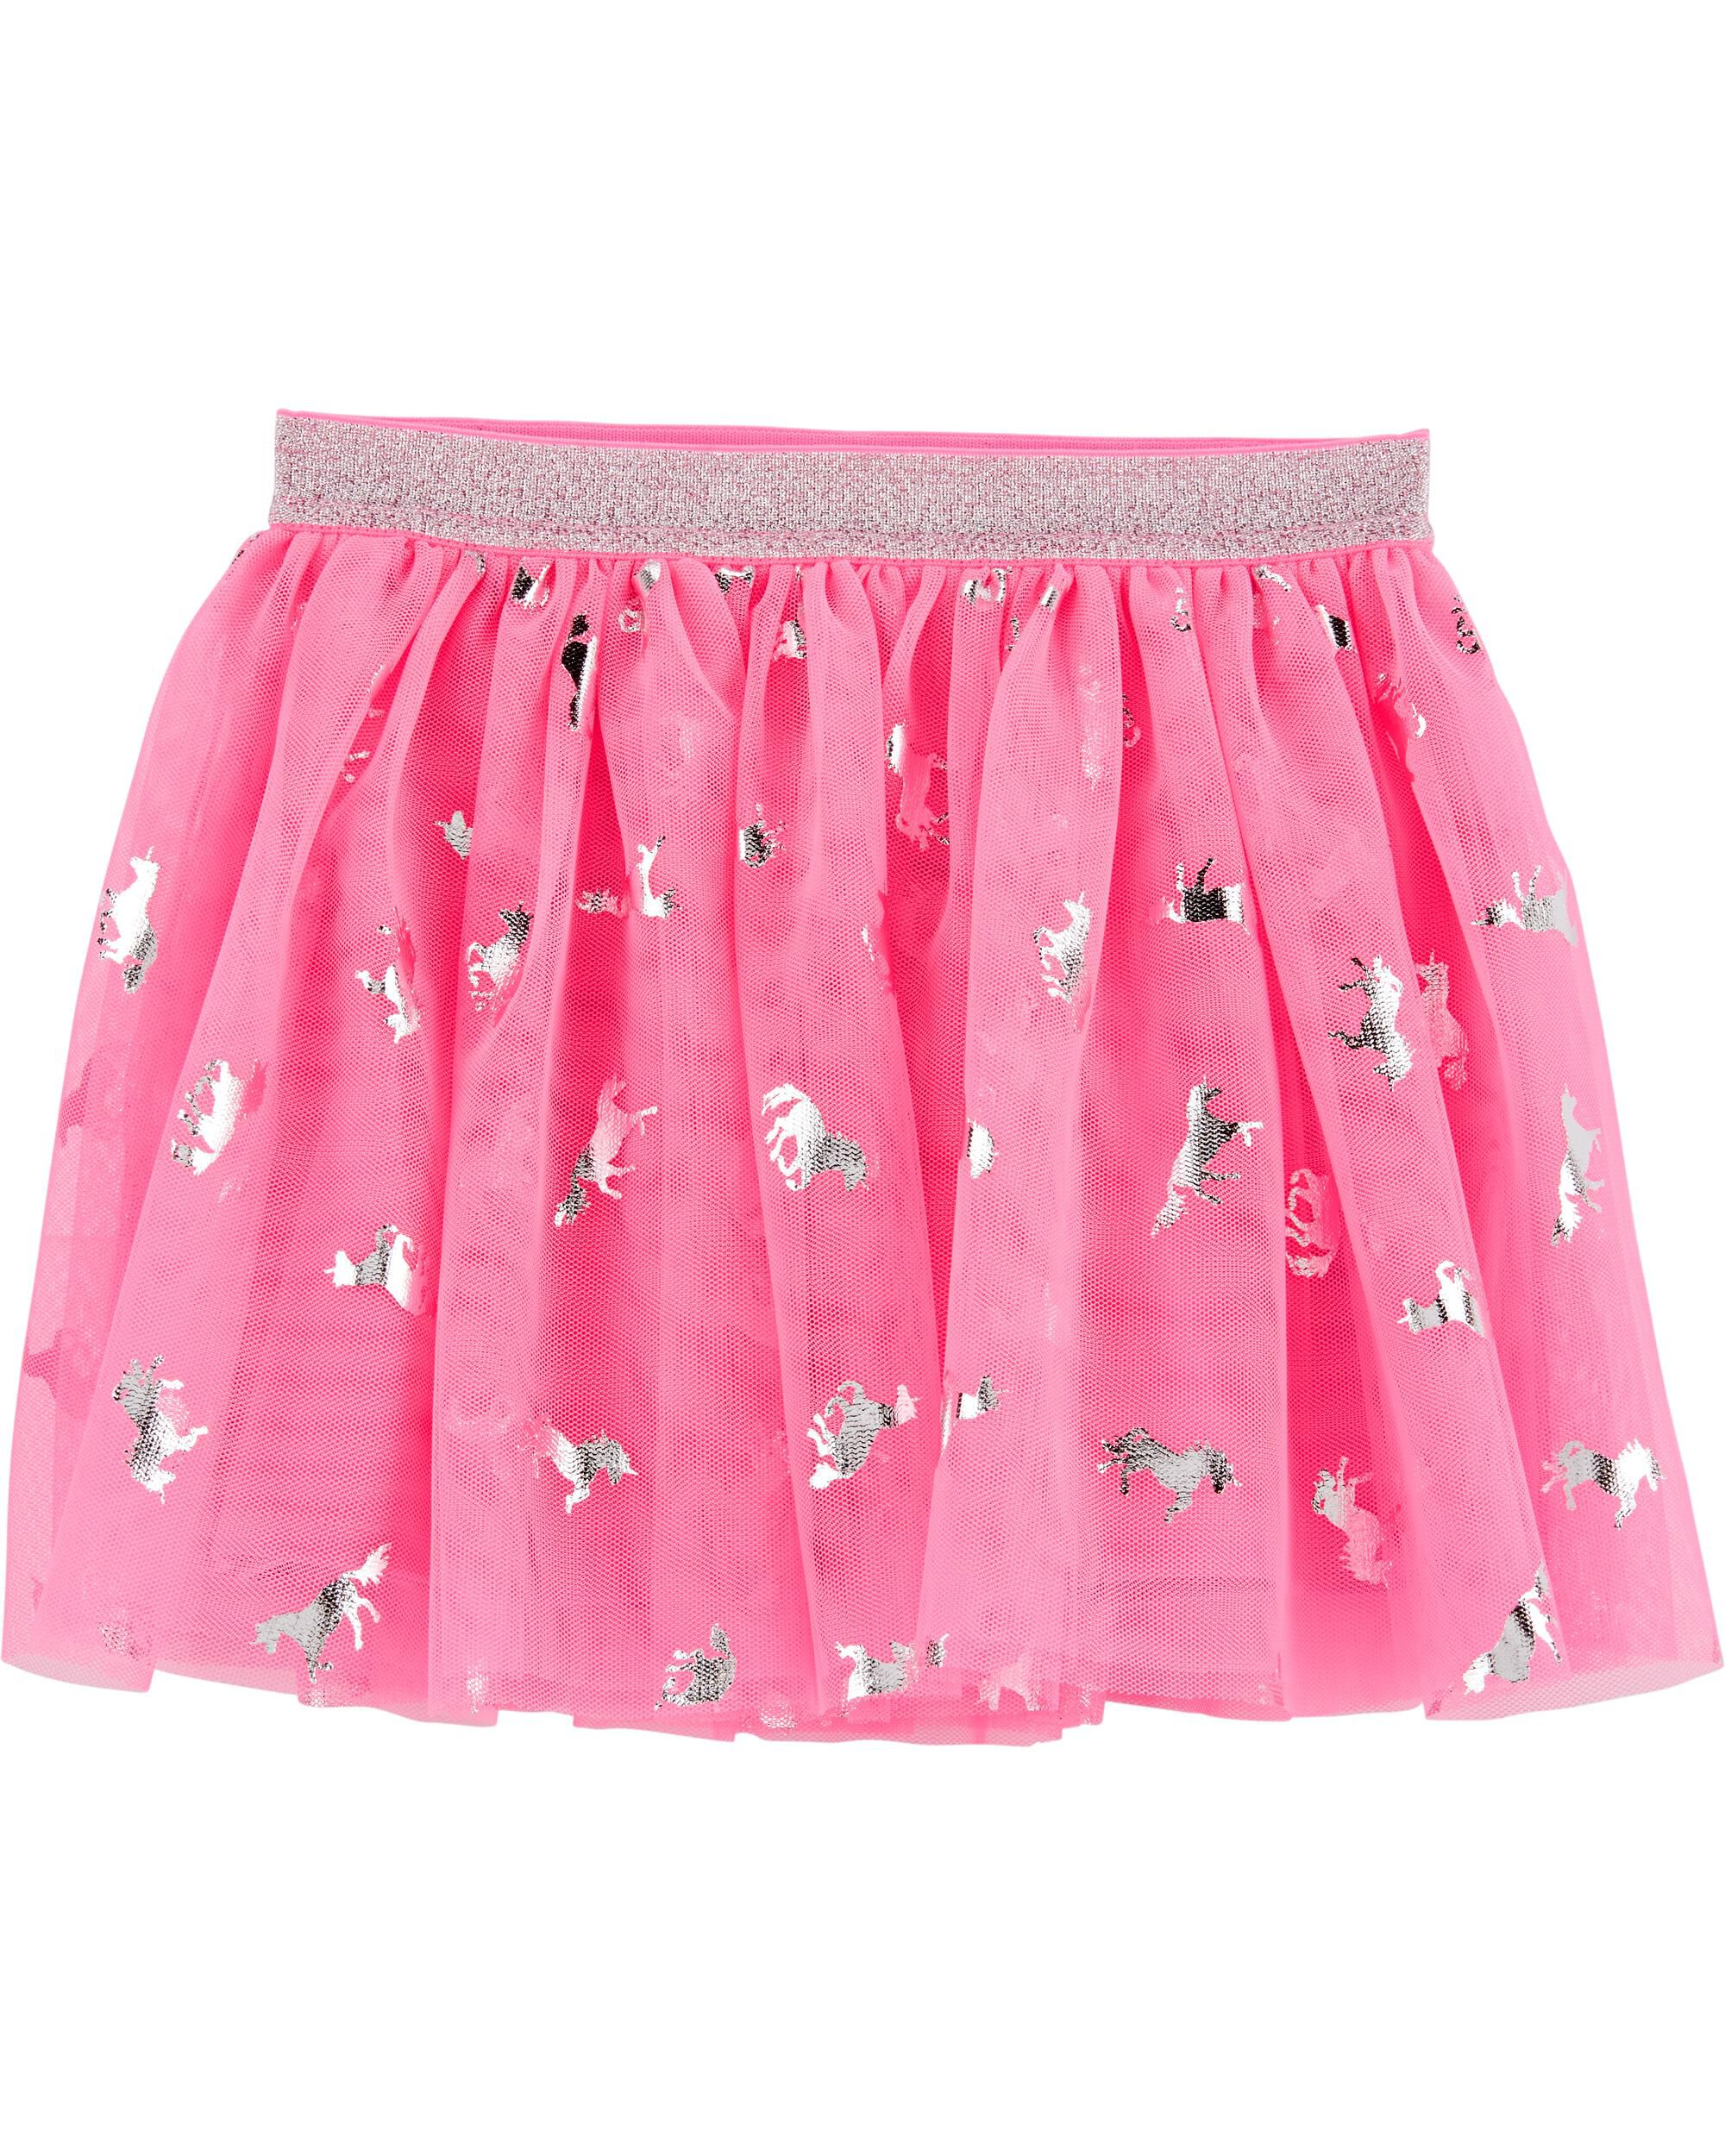 *Clearance*  Rainbow Unicorn Tulle Skirt